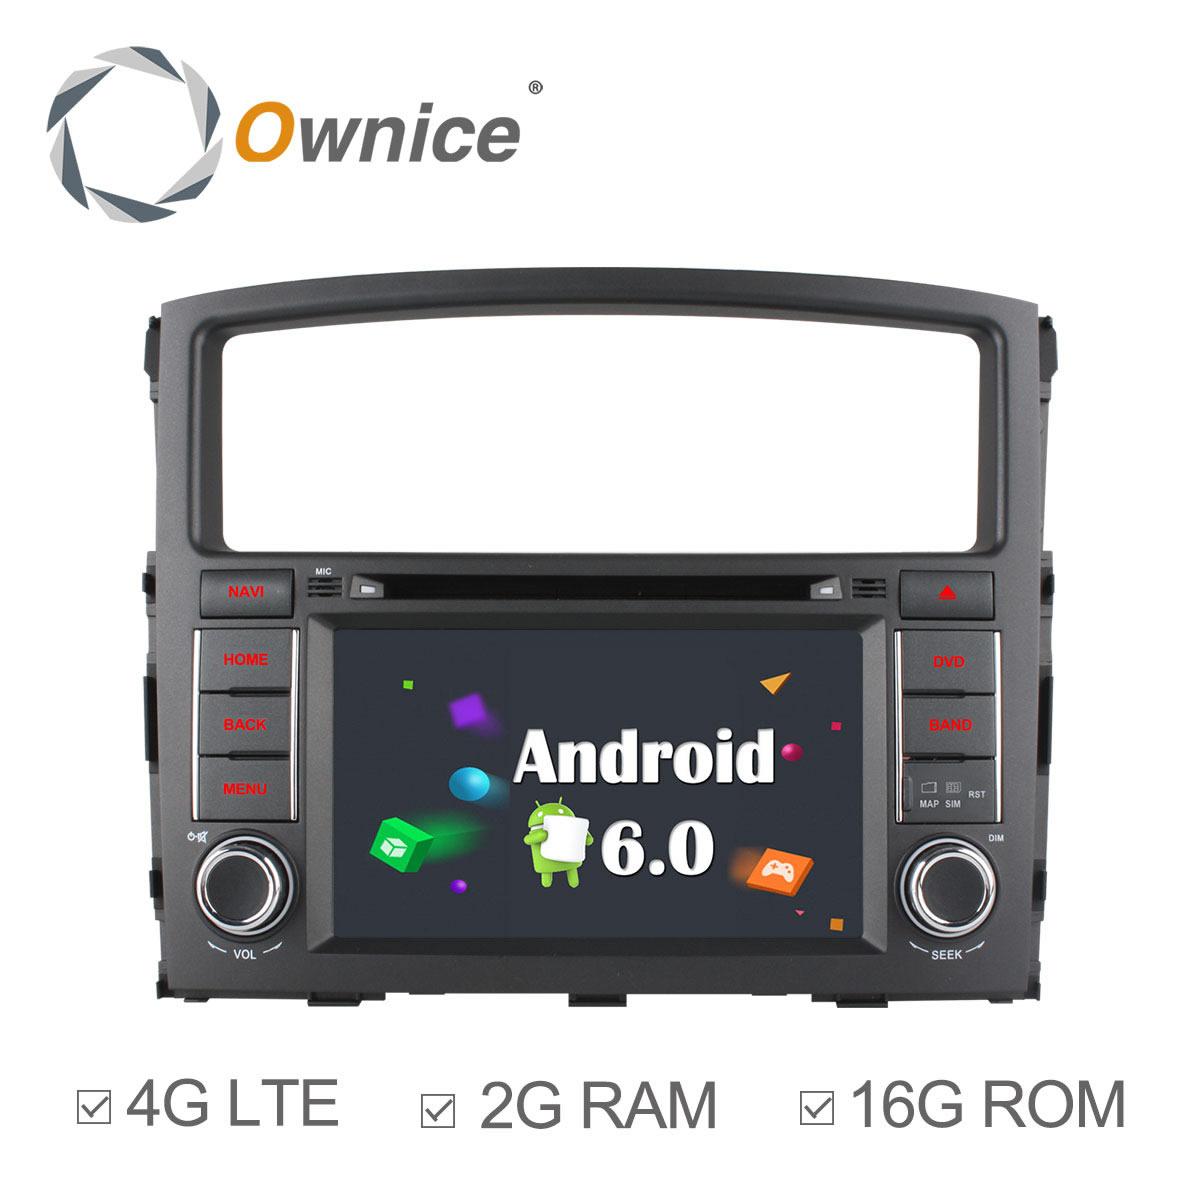 4G SIM LTE 1024*600 Android 6.0 For MITSUBISHI PAJERO V97 V93 2006 -2012 Car DVD Player GPS NAVI radio support DAB+ TPMS DVR